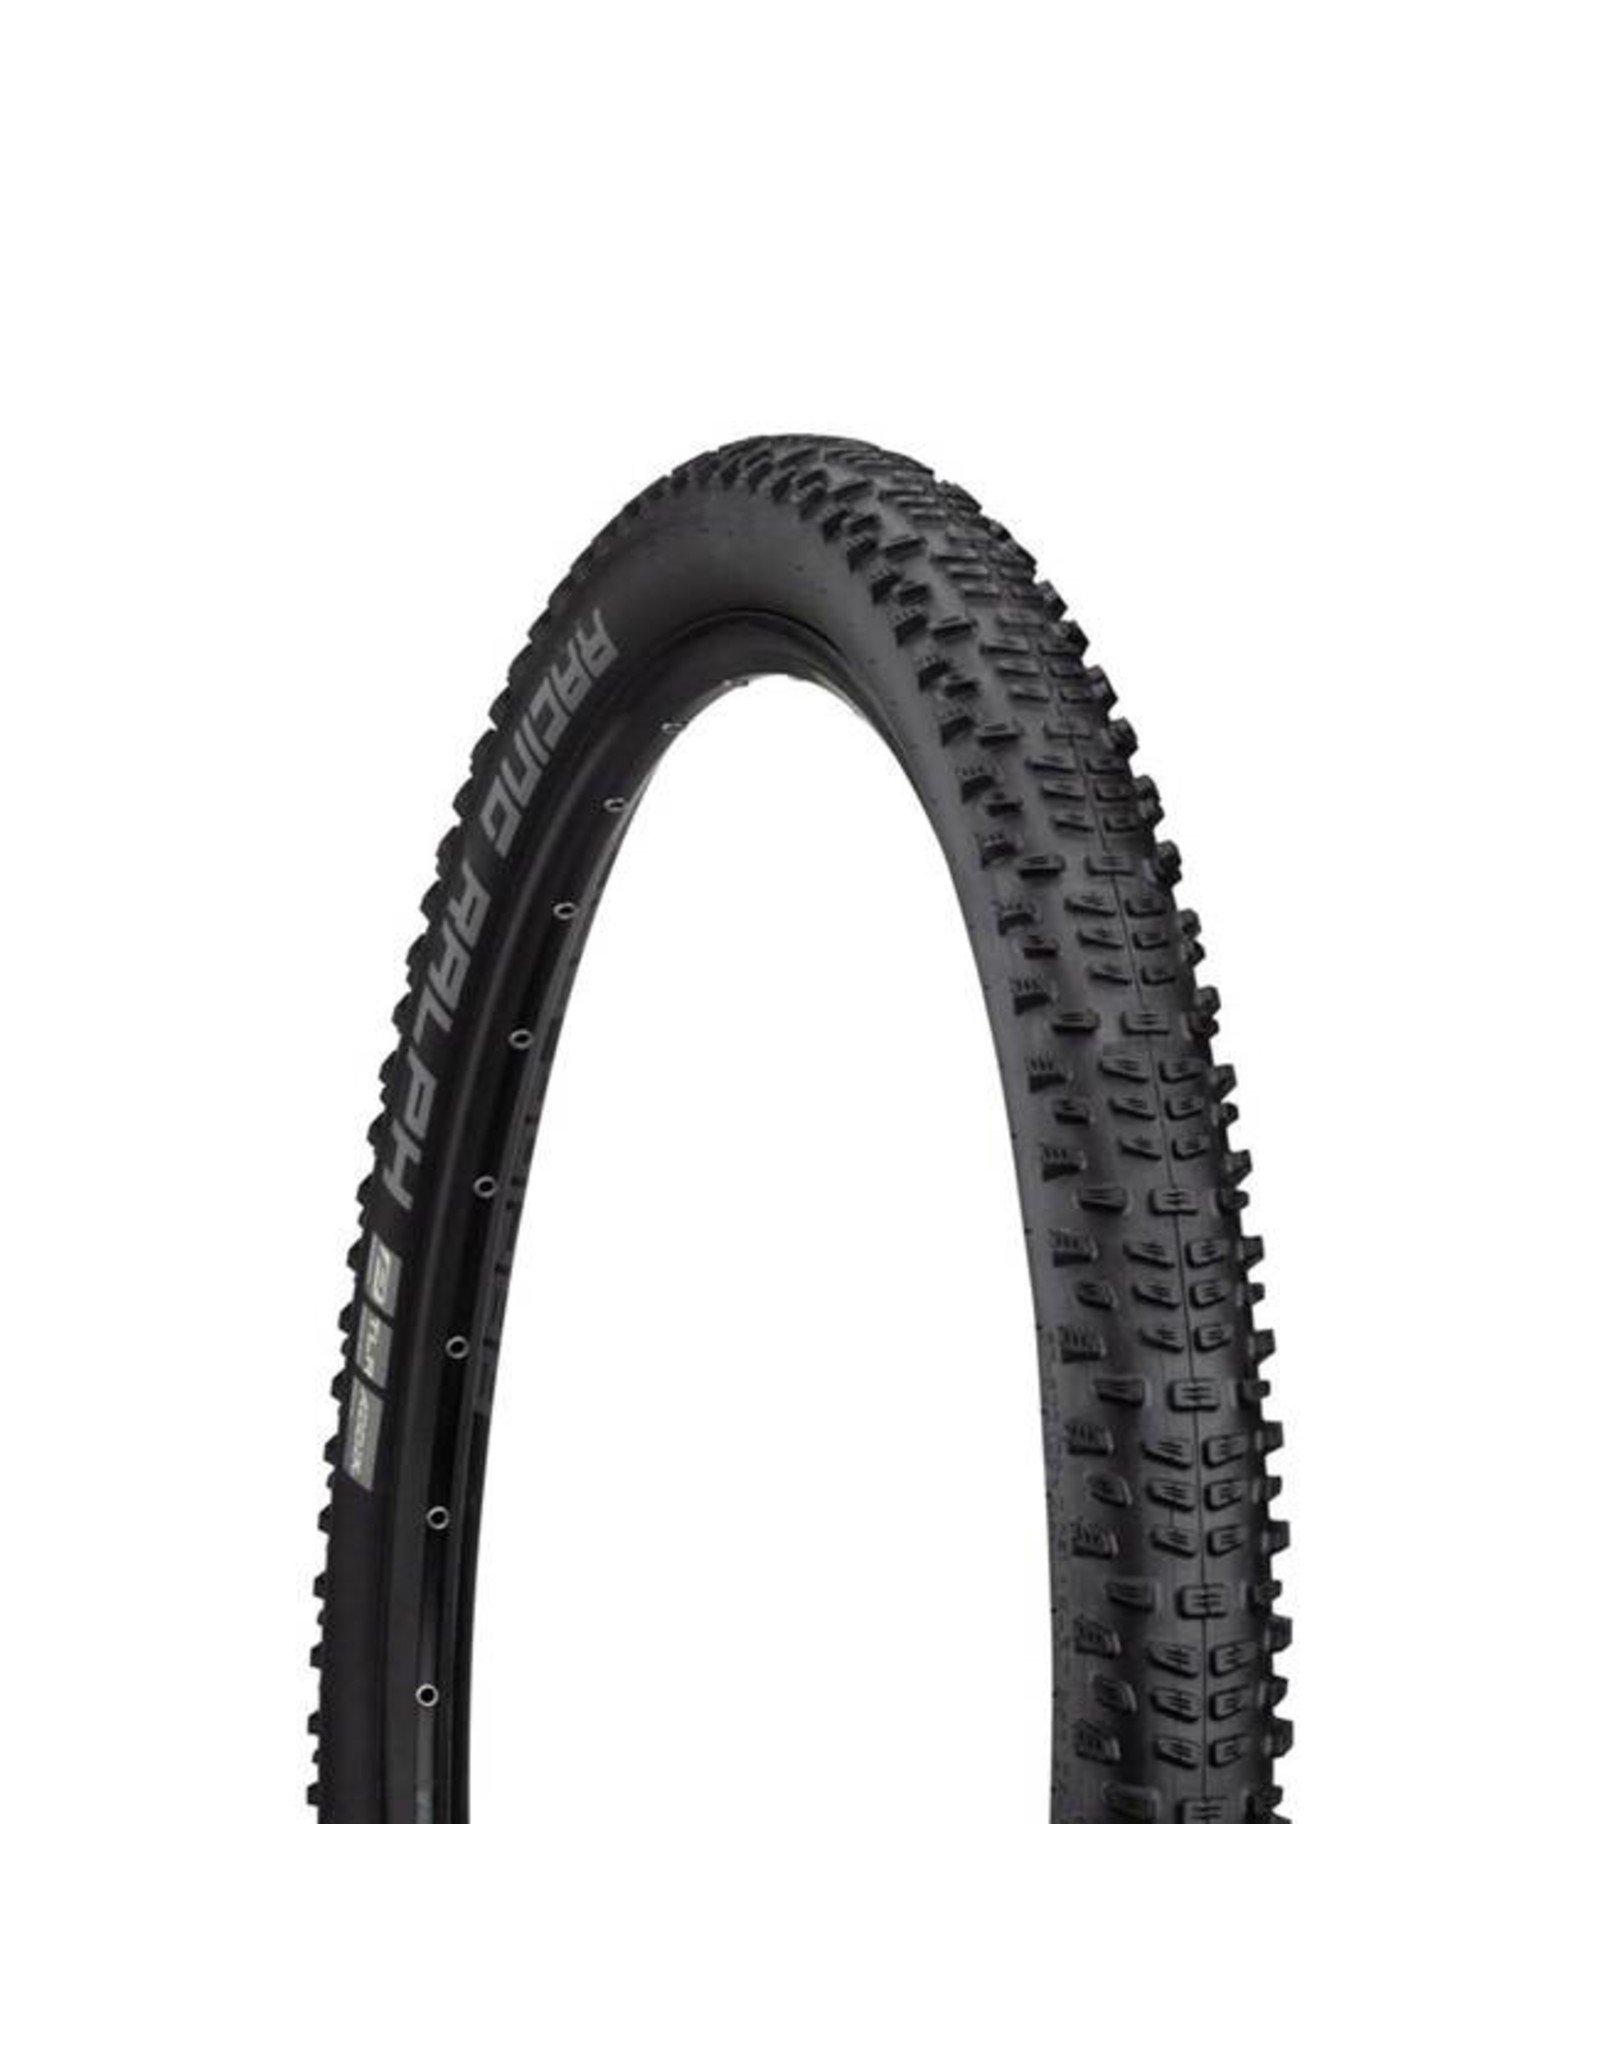 "Schwalbe Schwalbe Racing Ralph Tire: 29 x 2.25"", Folding Bead, Performance Line, Addix Performance Compound, TwinSkin, Tubeless Ready, Black"